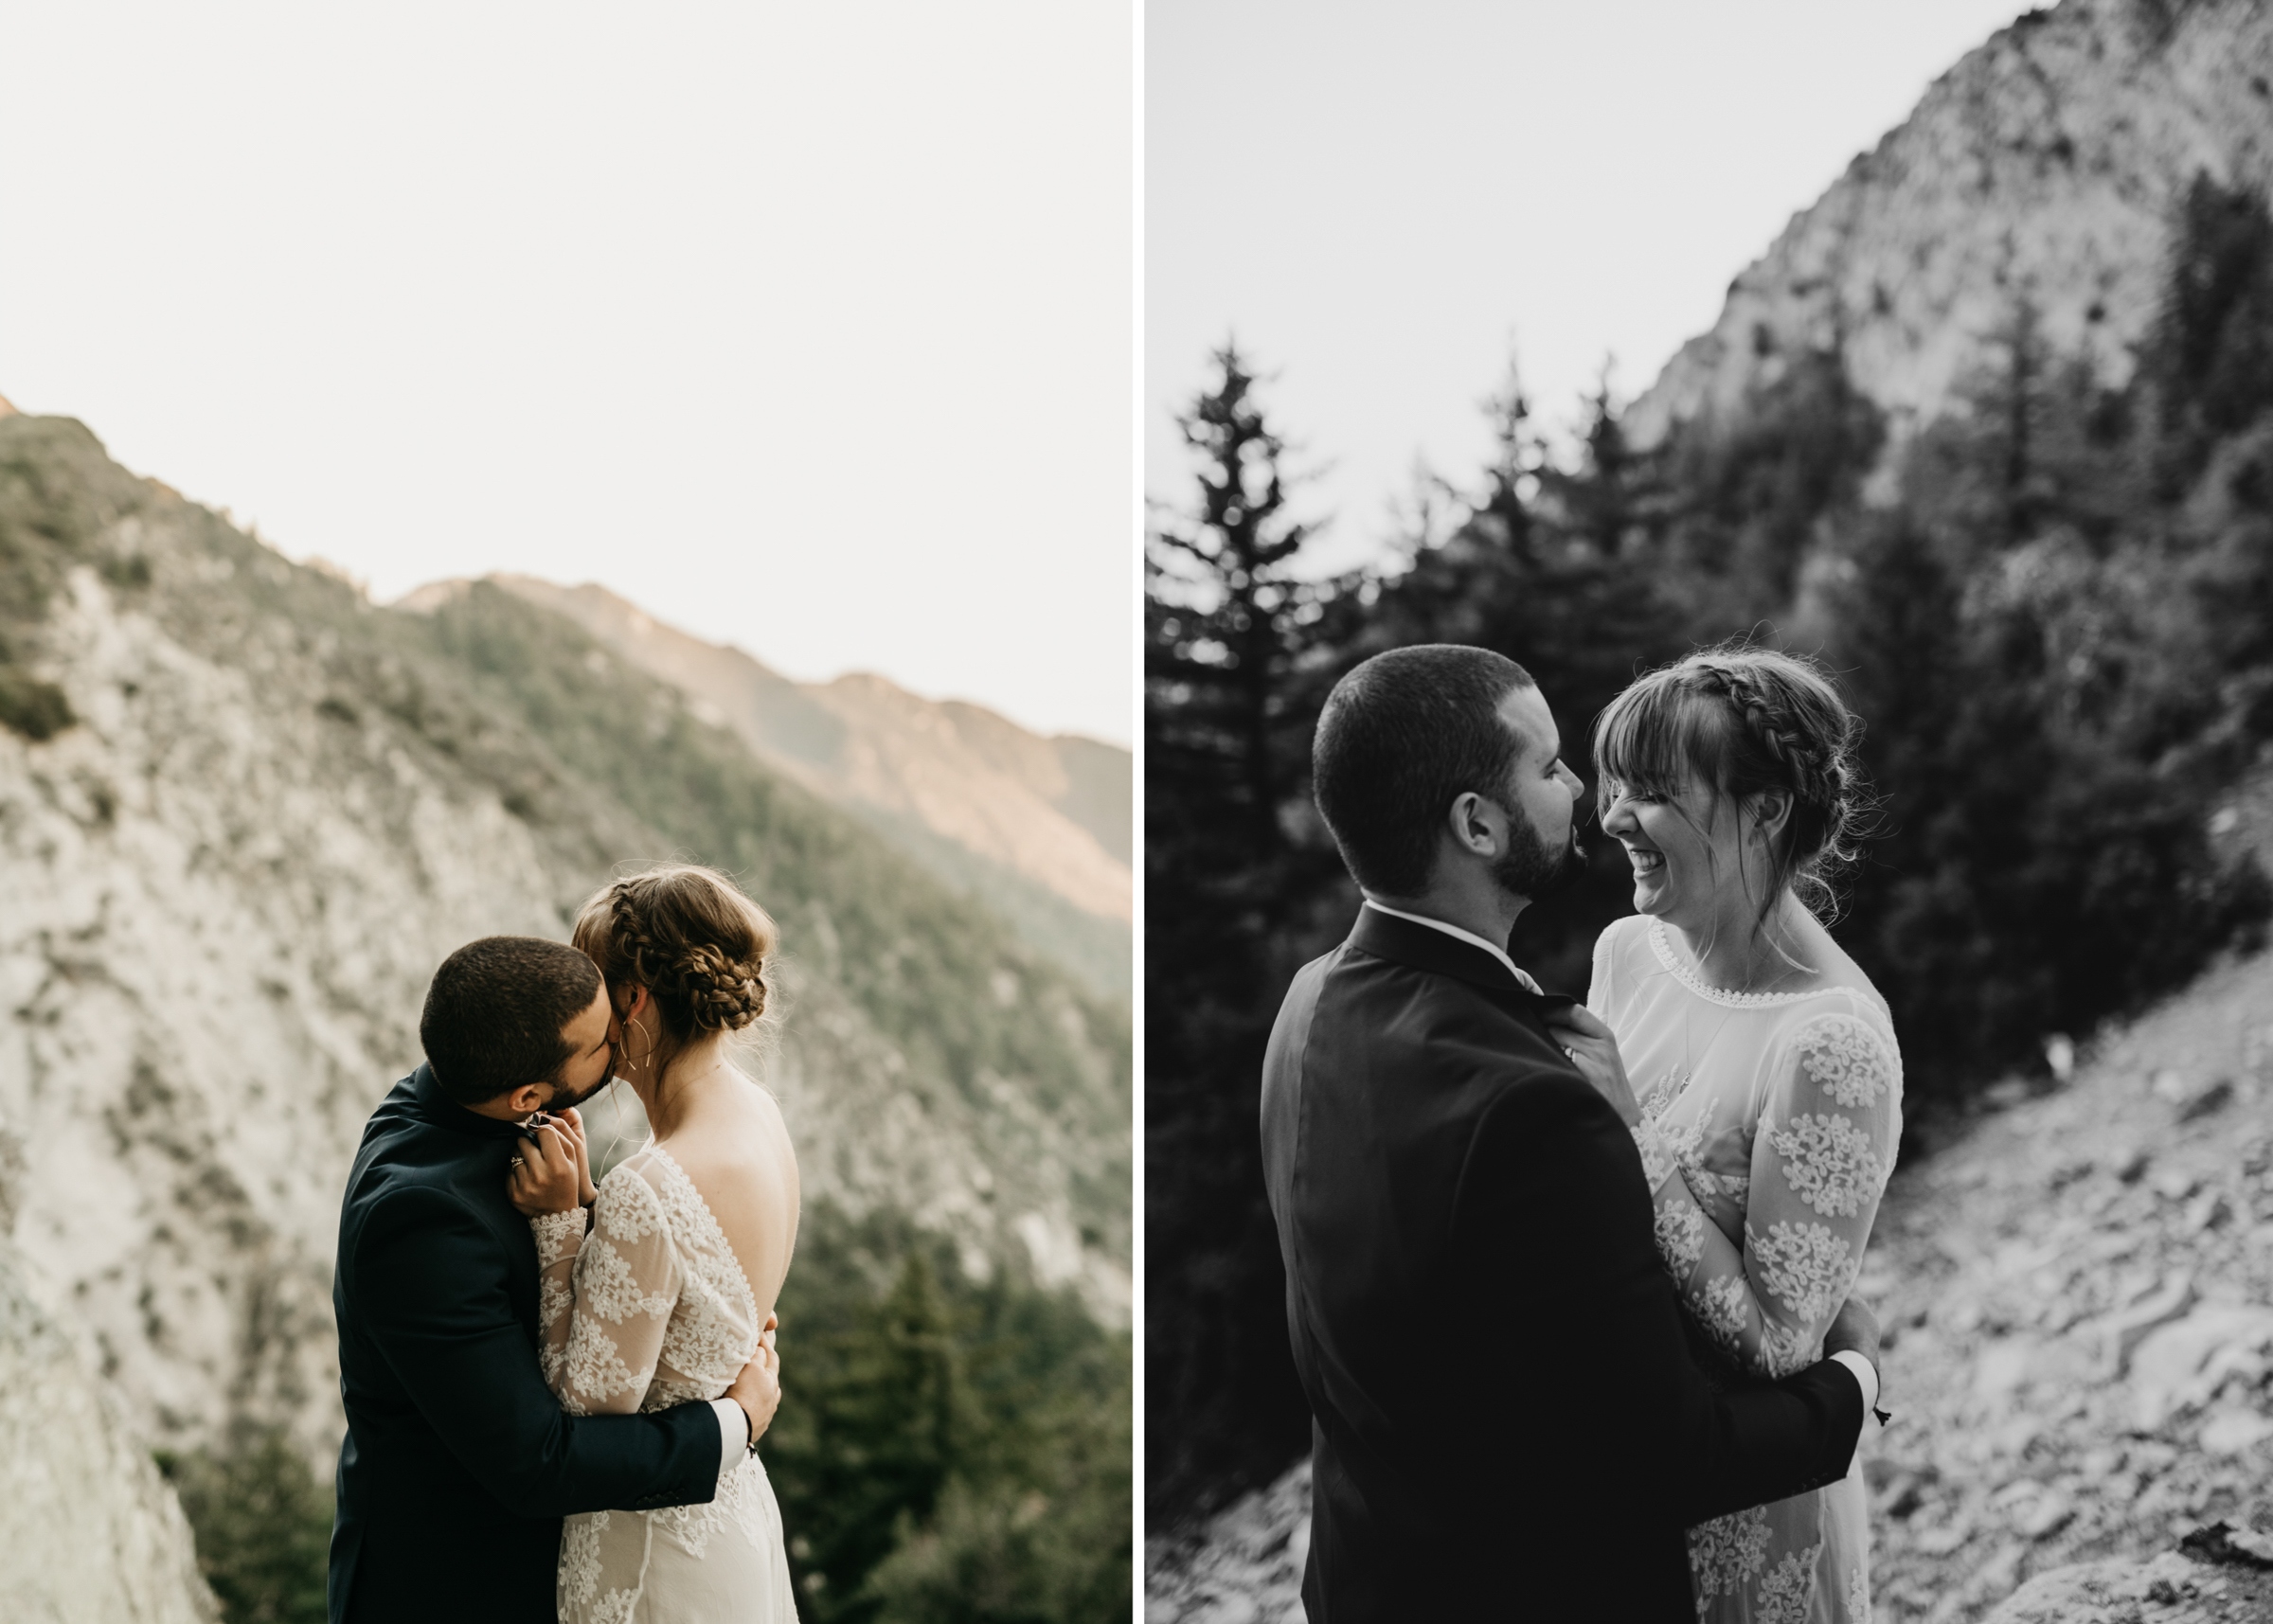 ©Isaiah + Taylor Photography - Los Angeles Wedding Photographers - Los Angeles Forest Wedding -88.jpg